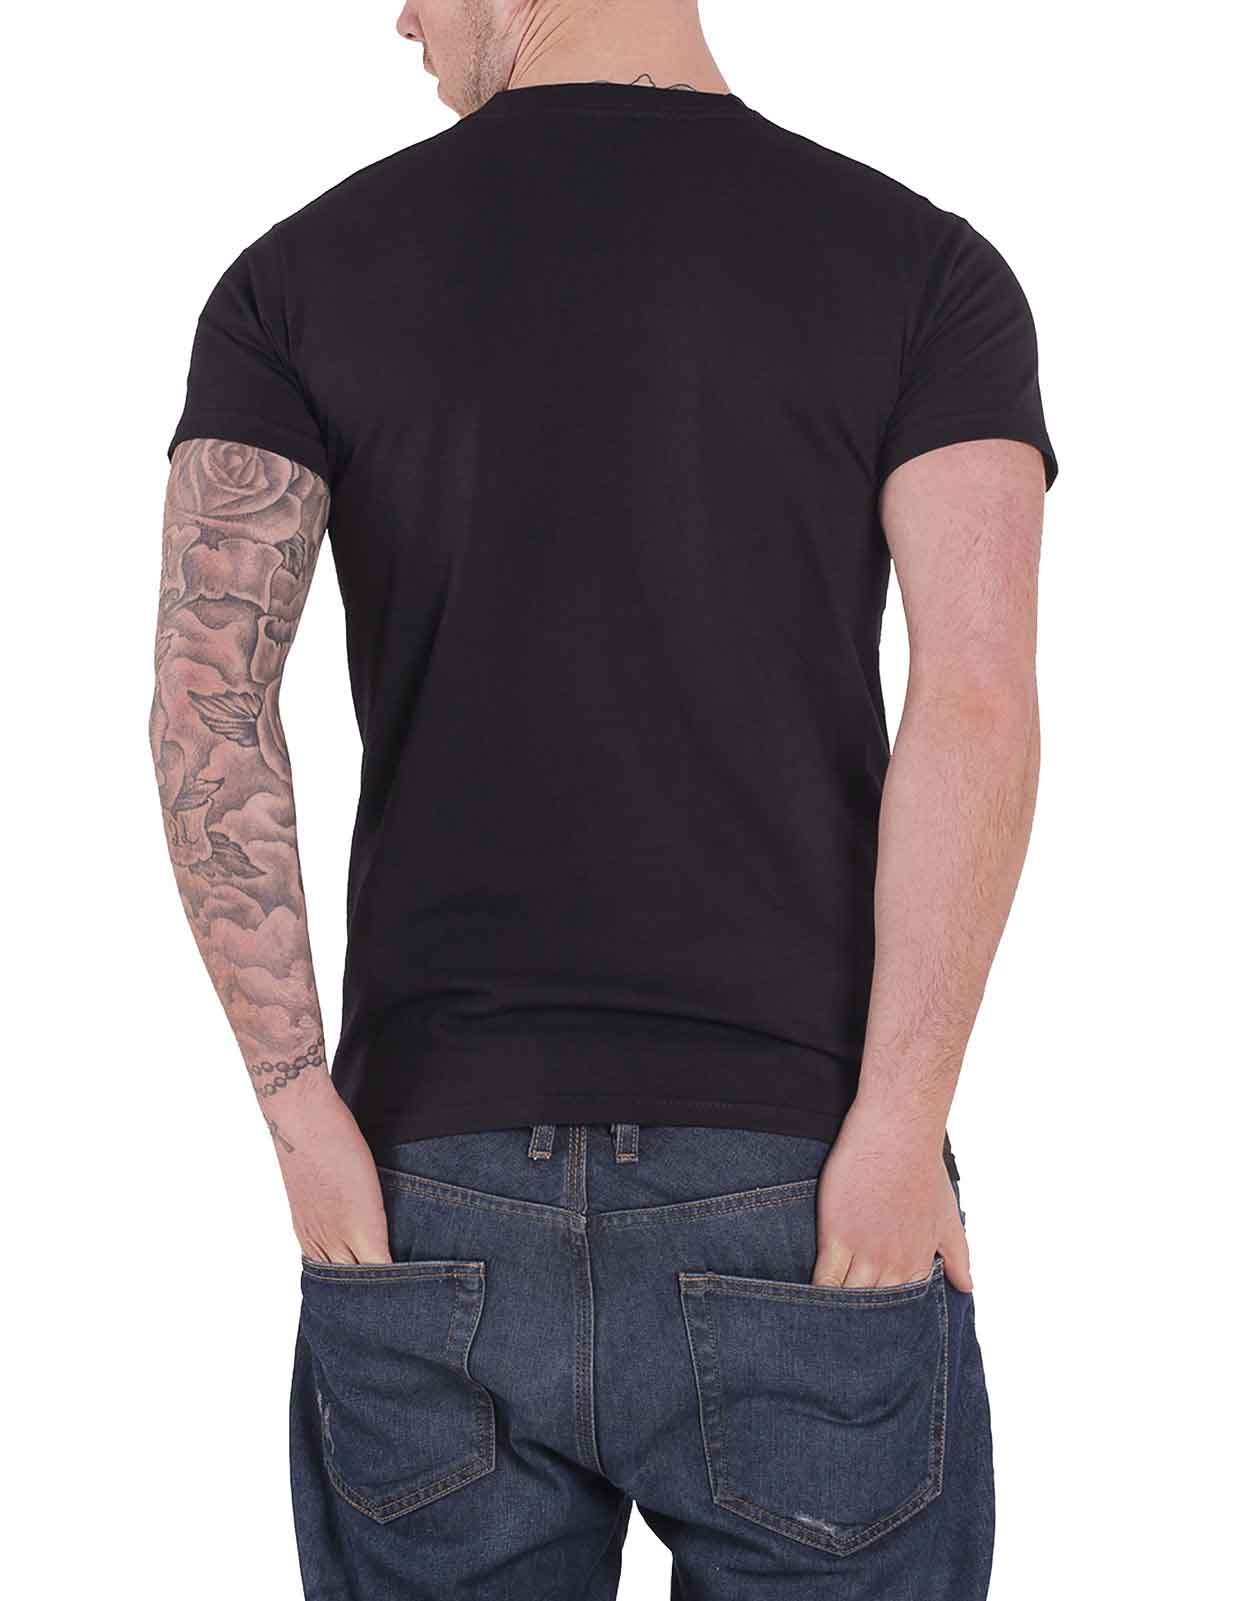 Officiel-Harry-Potter-T-Shirt-Poudlard-Gryffondor-Poufsouffle-cretes-Homme-NEUF miniature 27